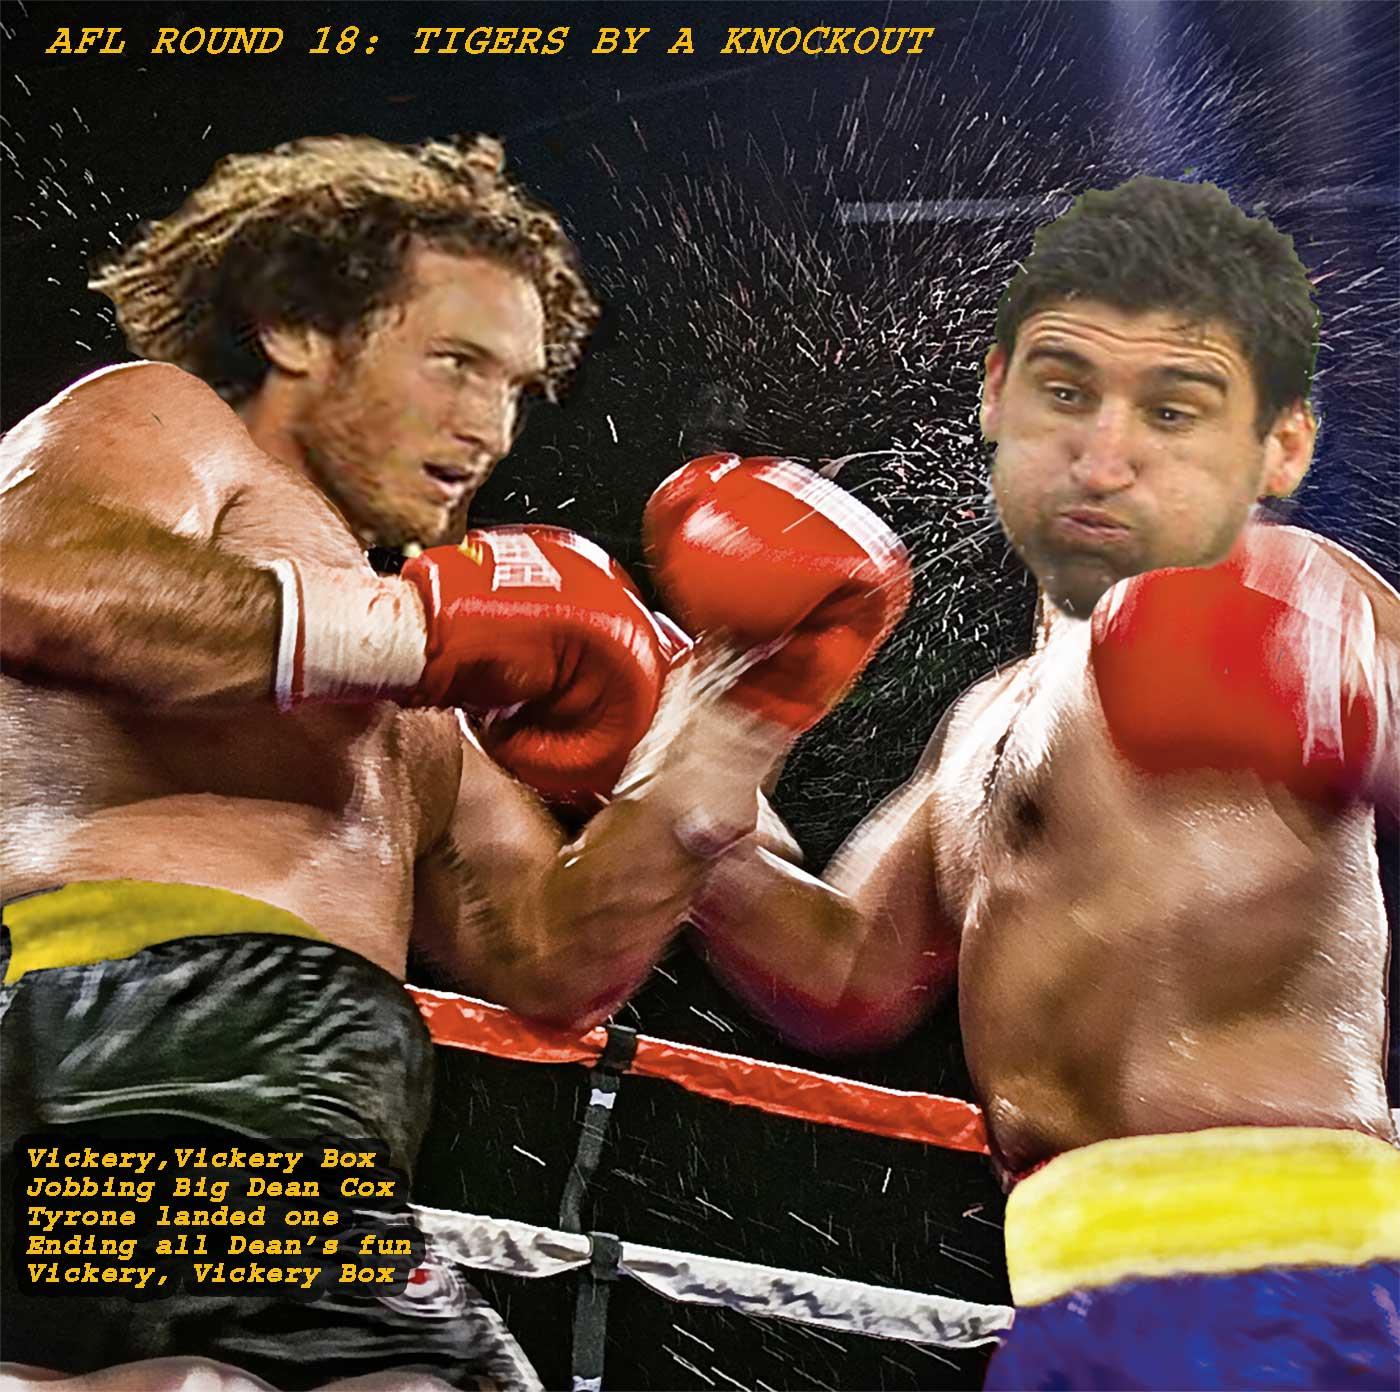 AFL-Round-18-Knockout.jpg